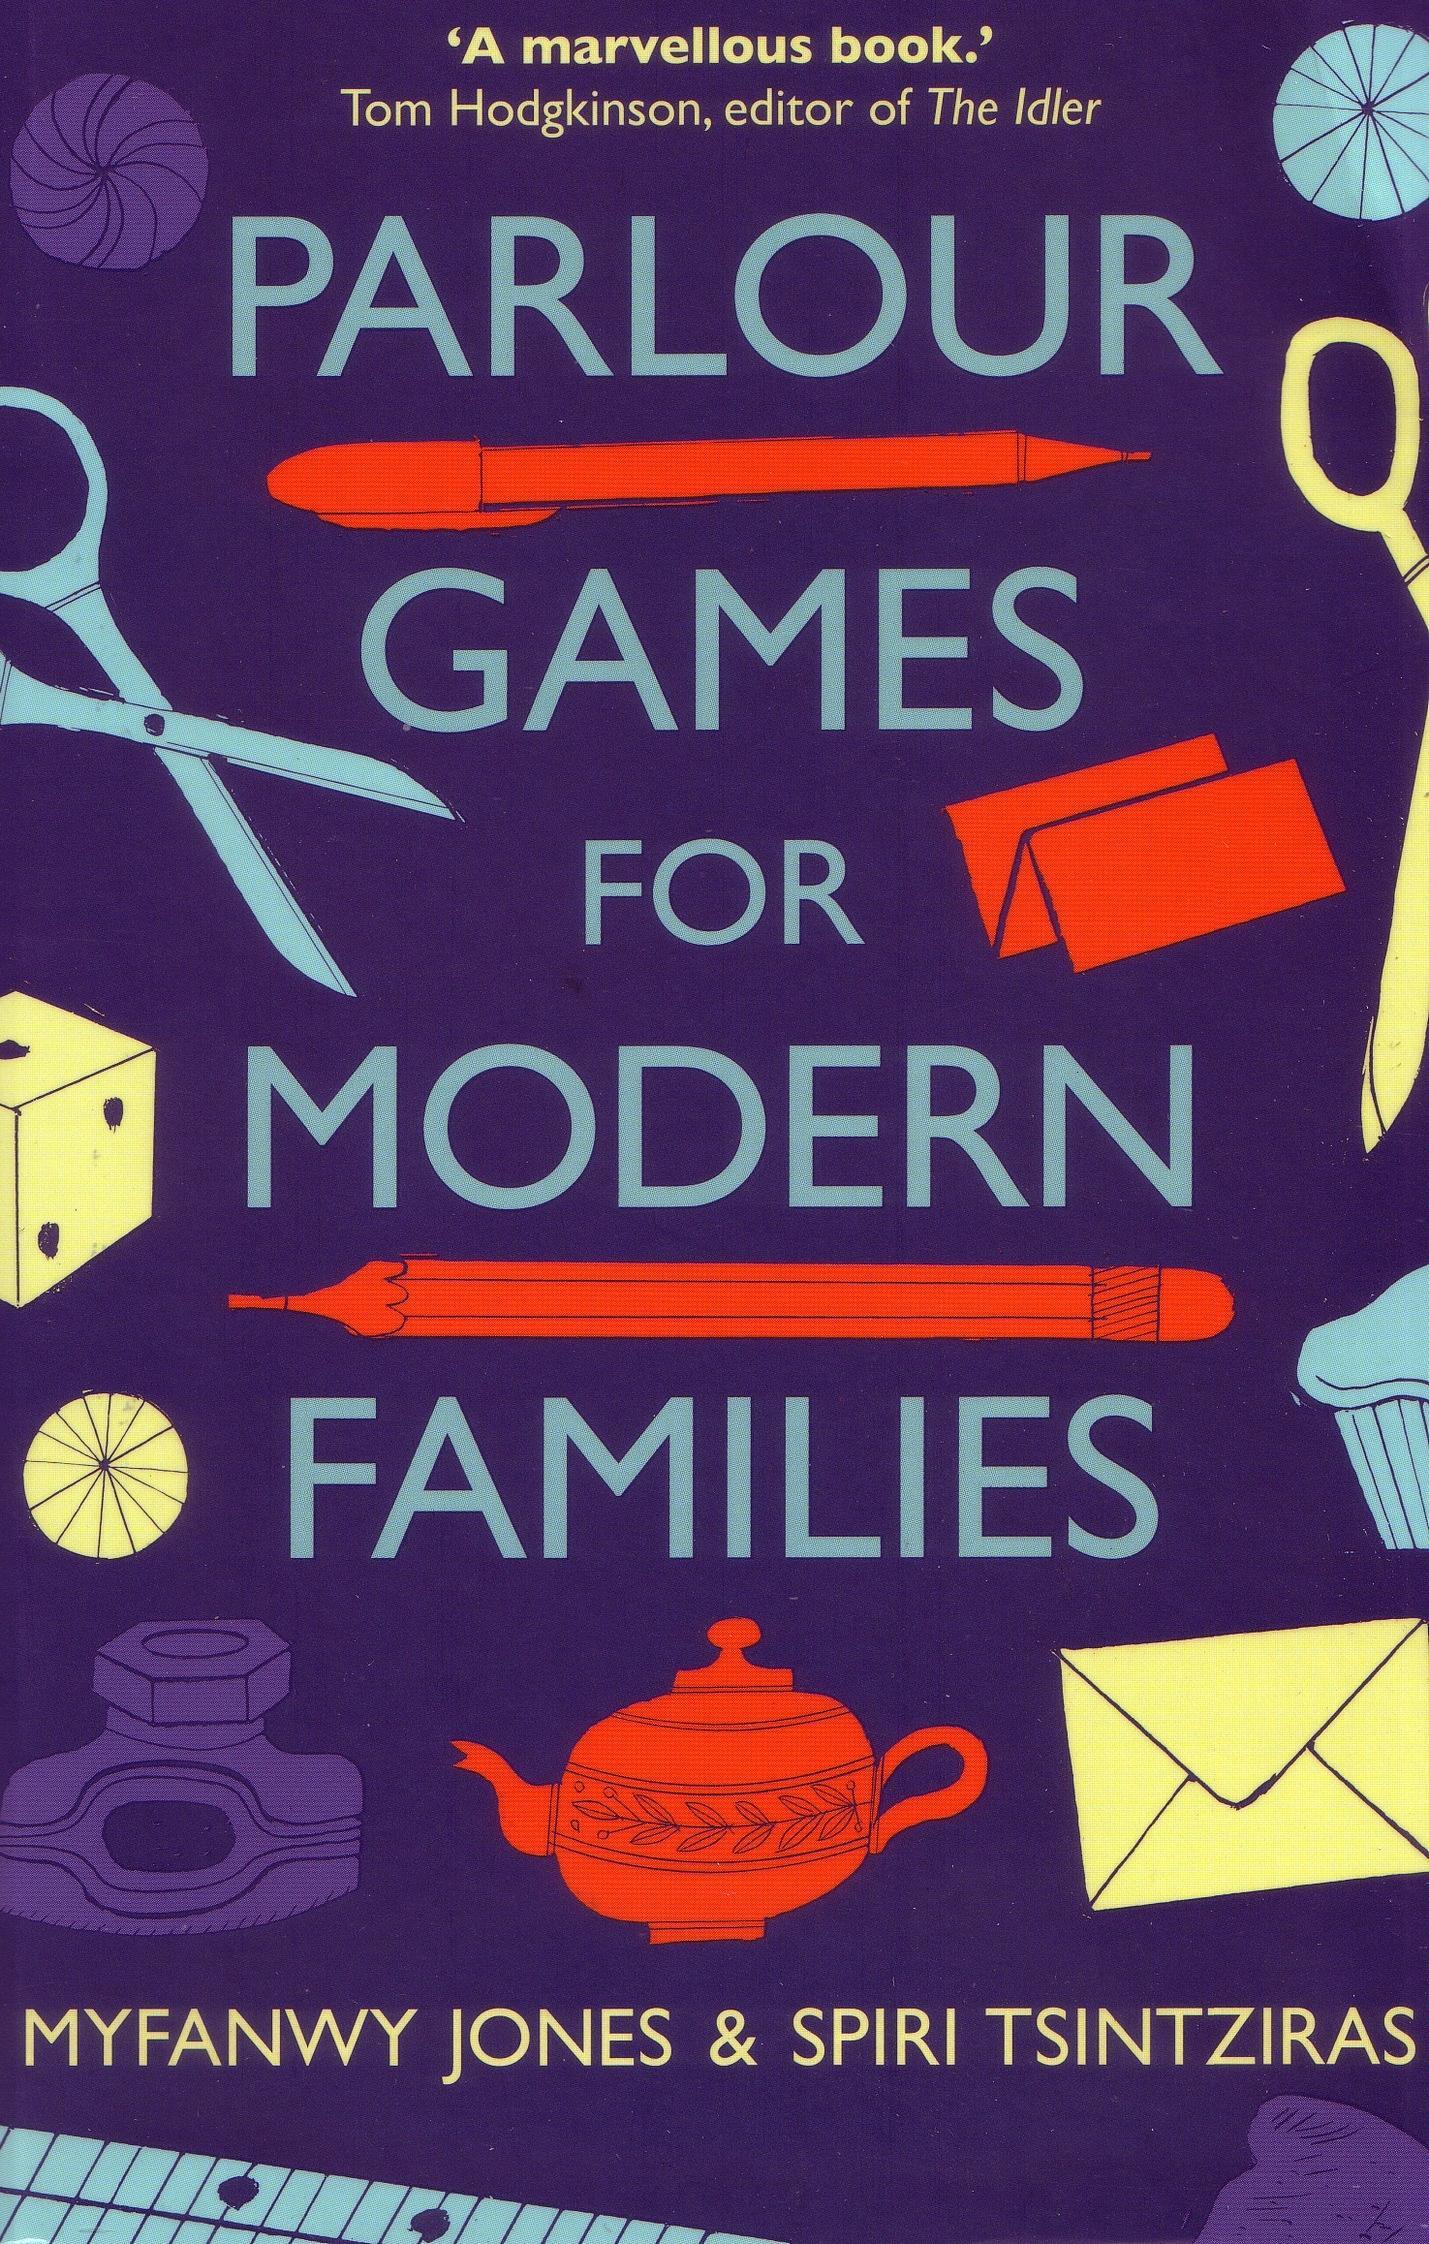 Parlour Games forModernFamilies